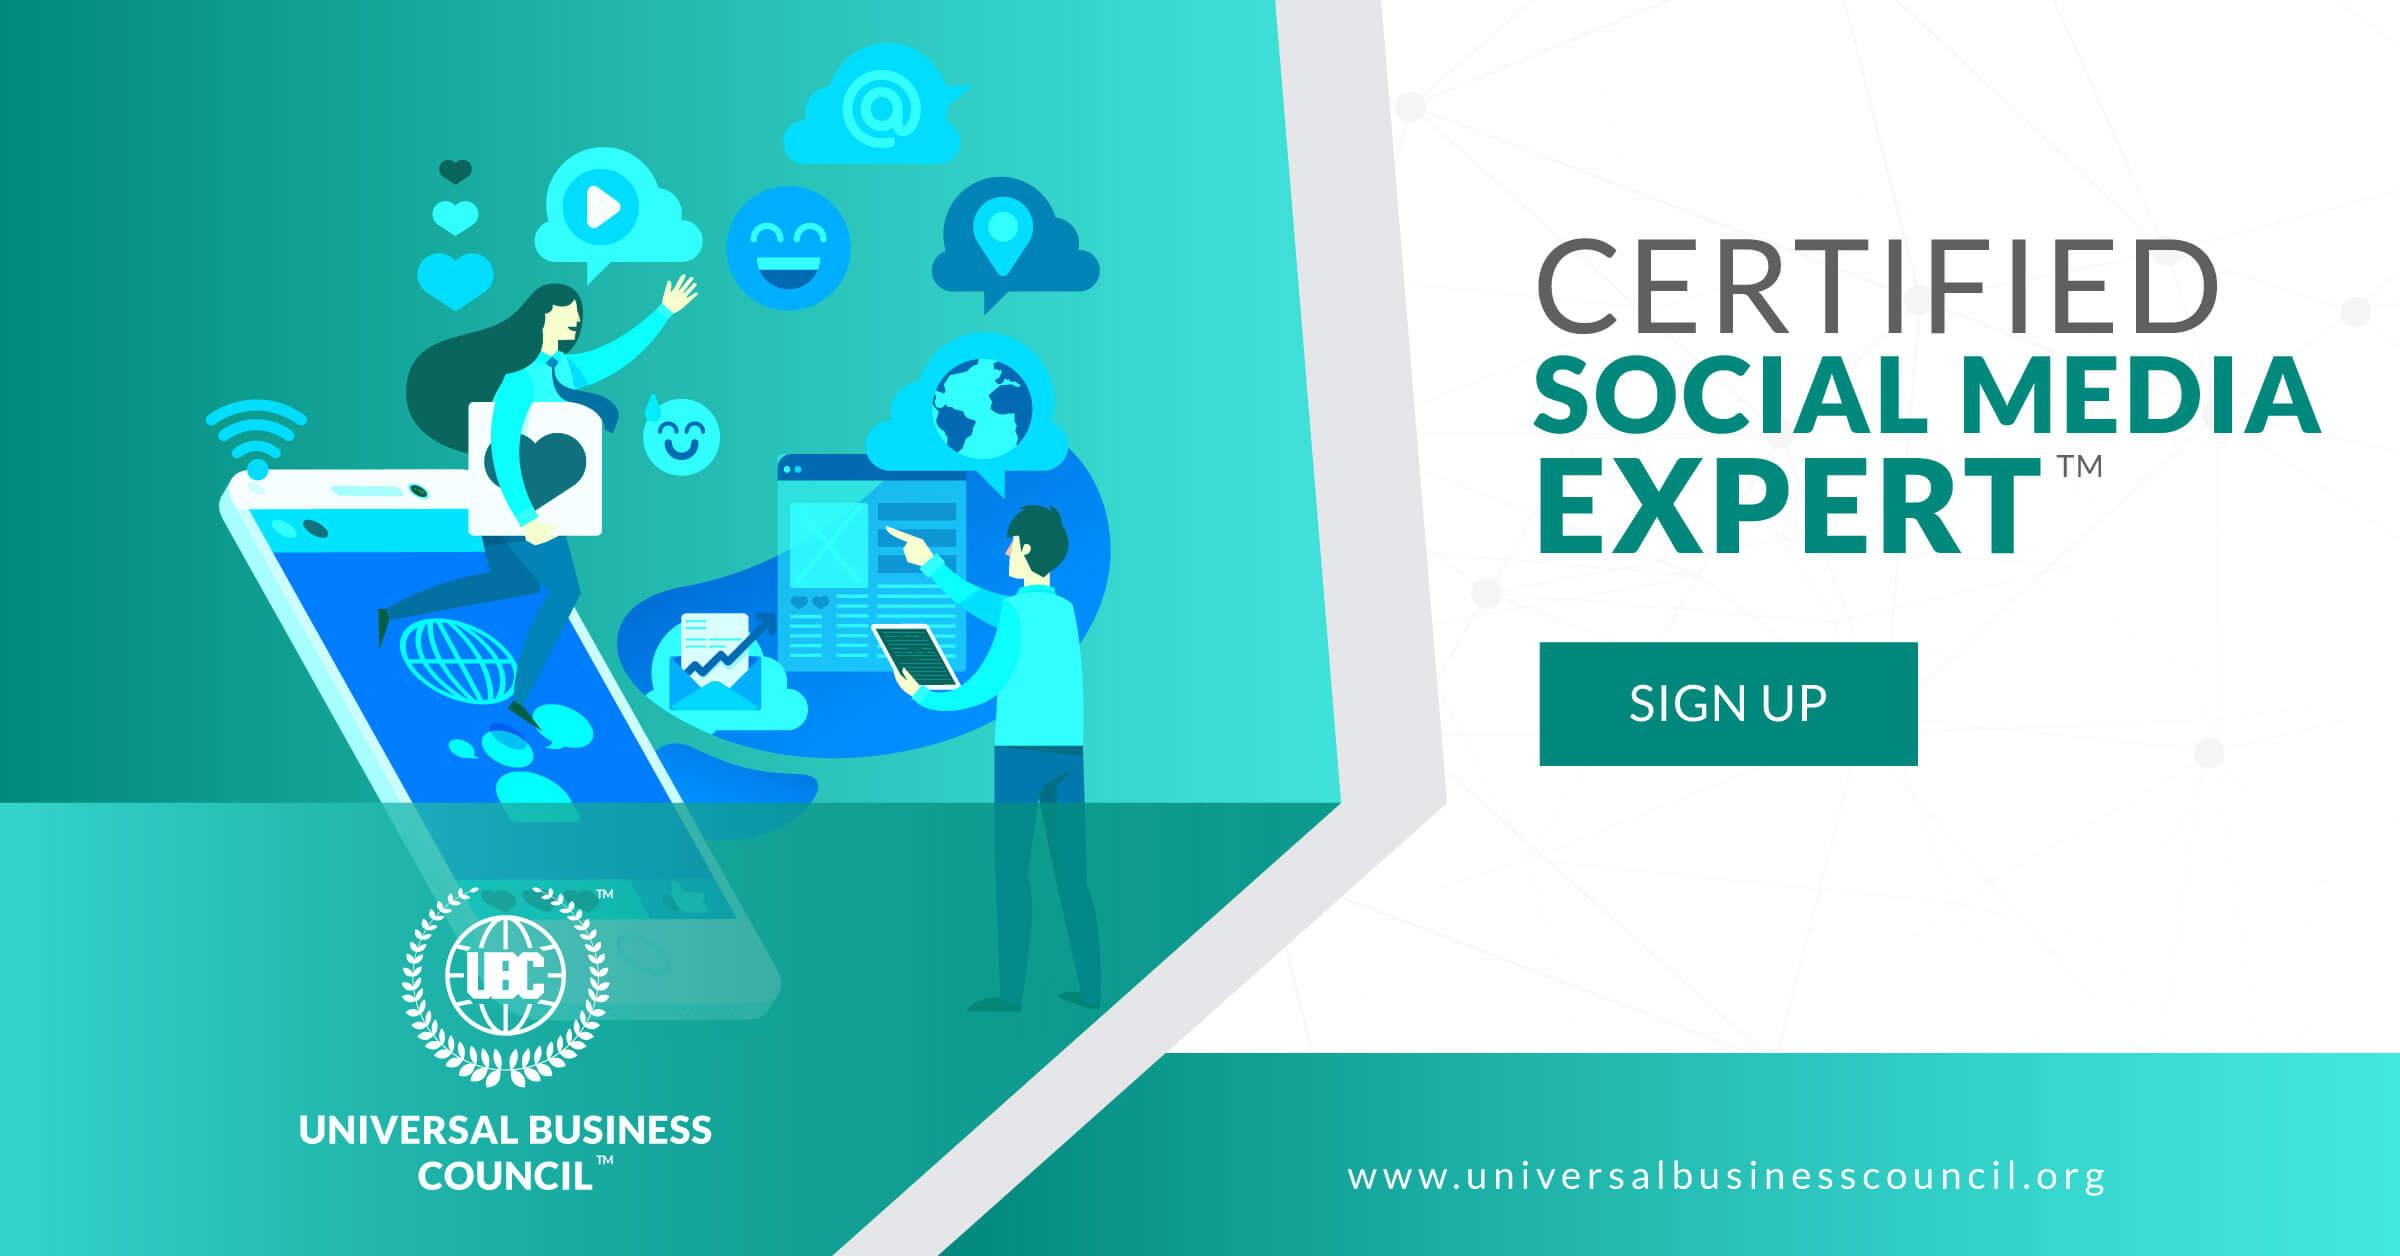 Certified-Social-Media-Expert-1